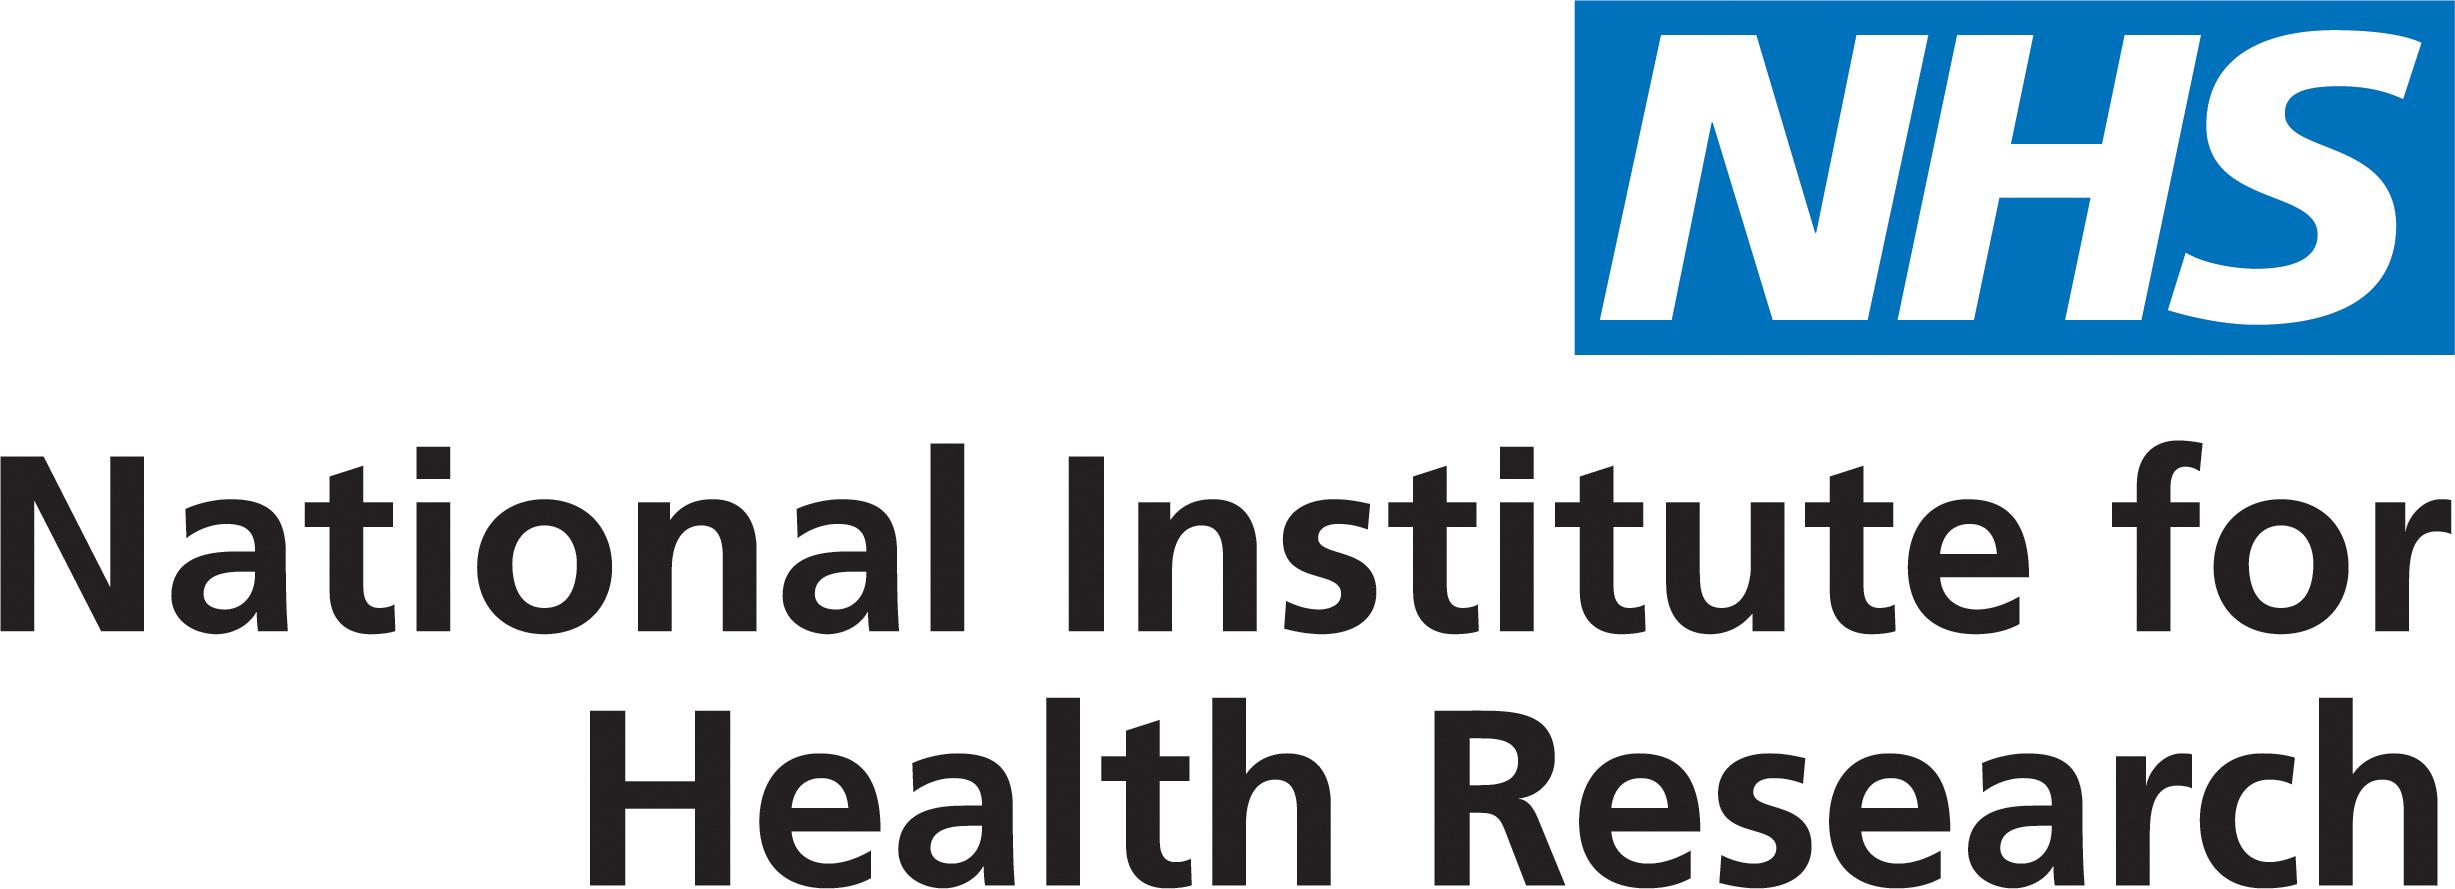 NIHR_logo_2018.jpg